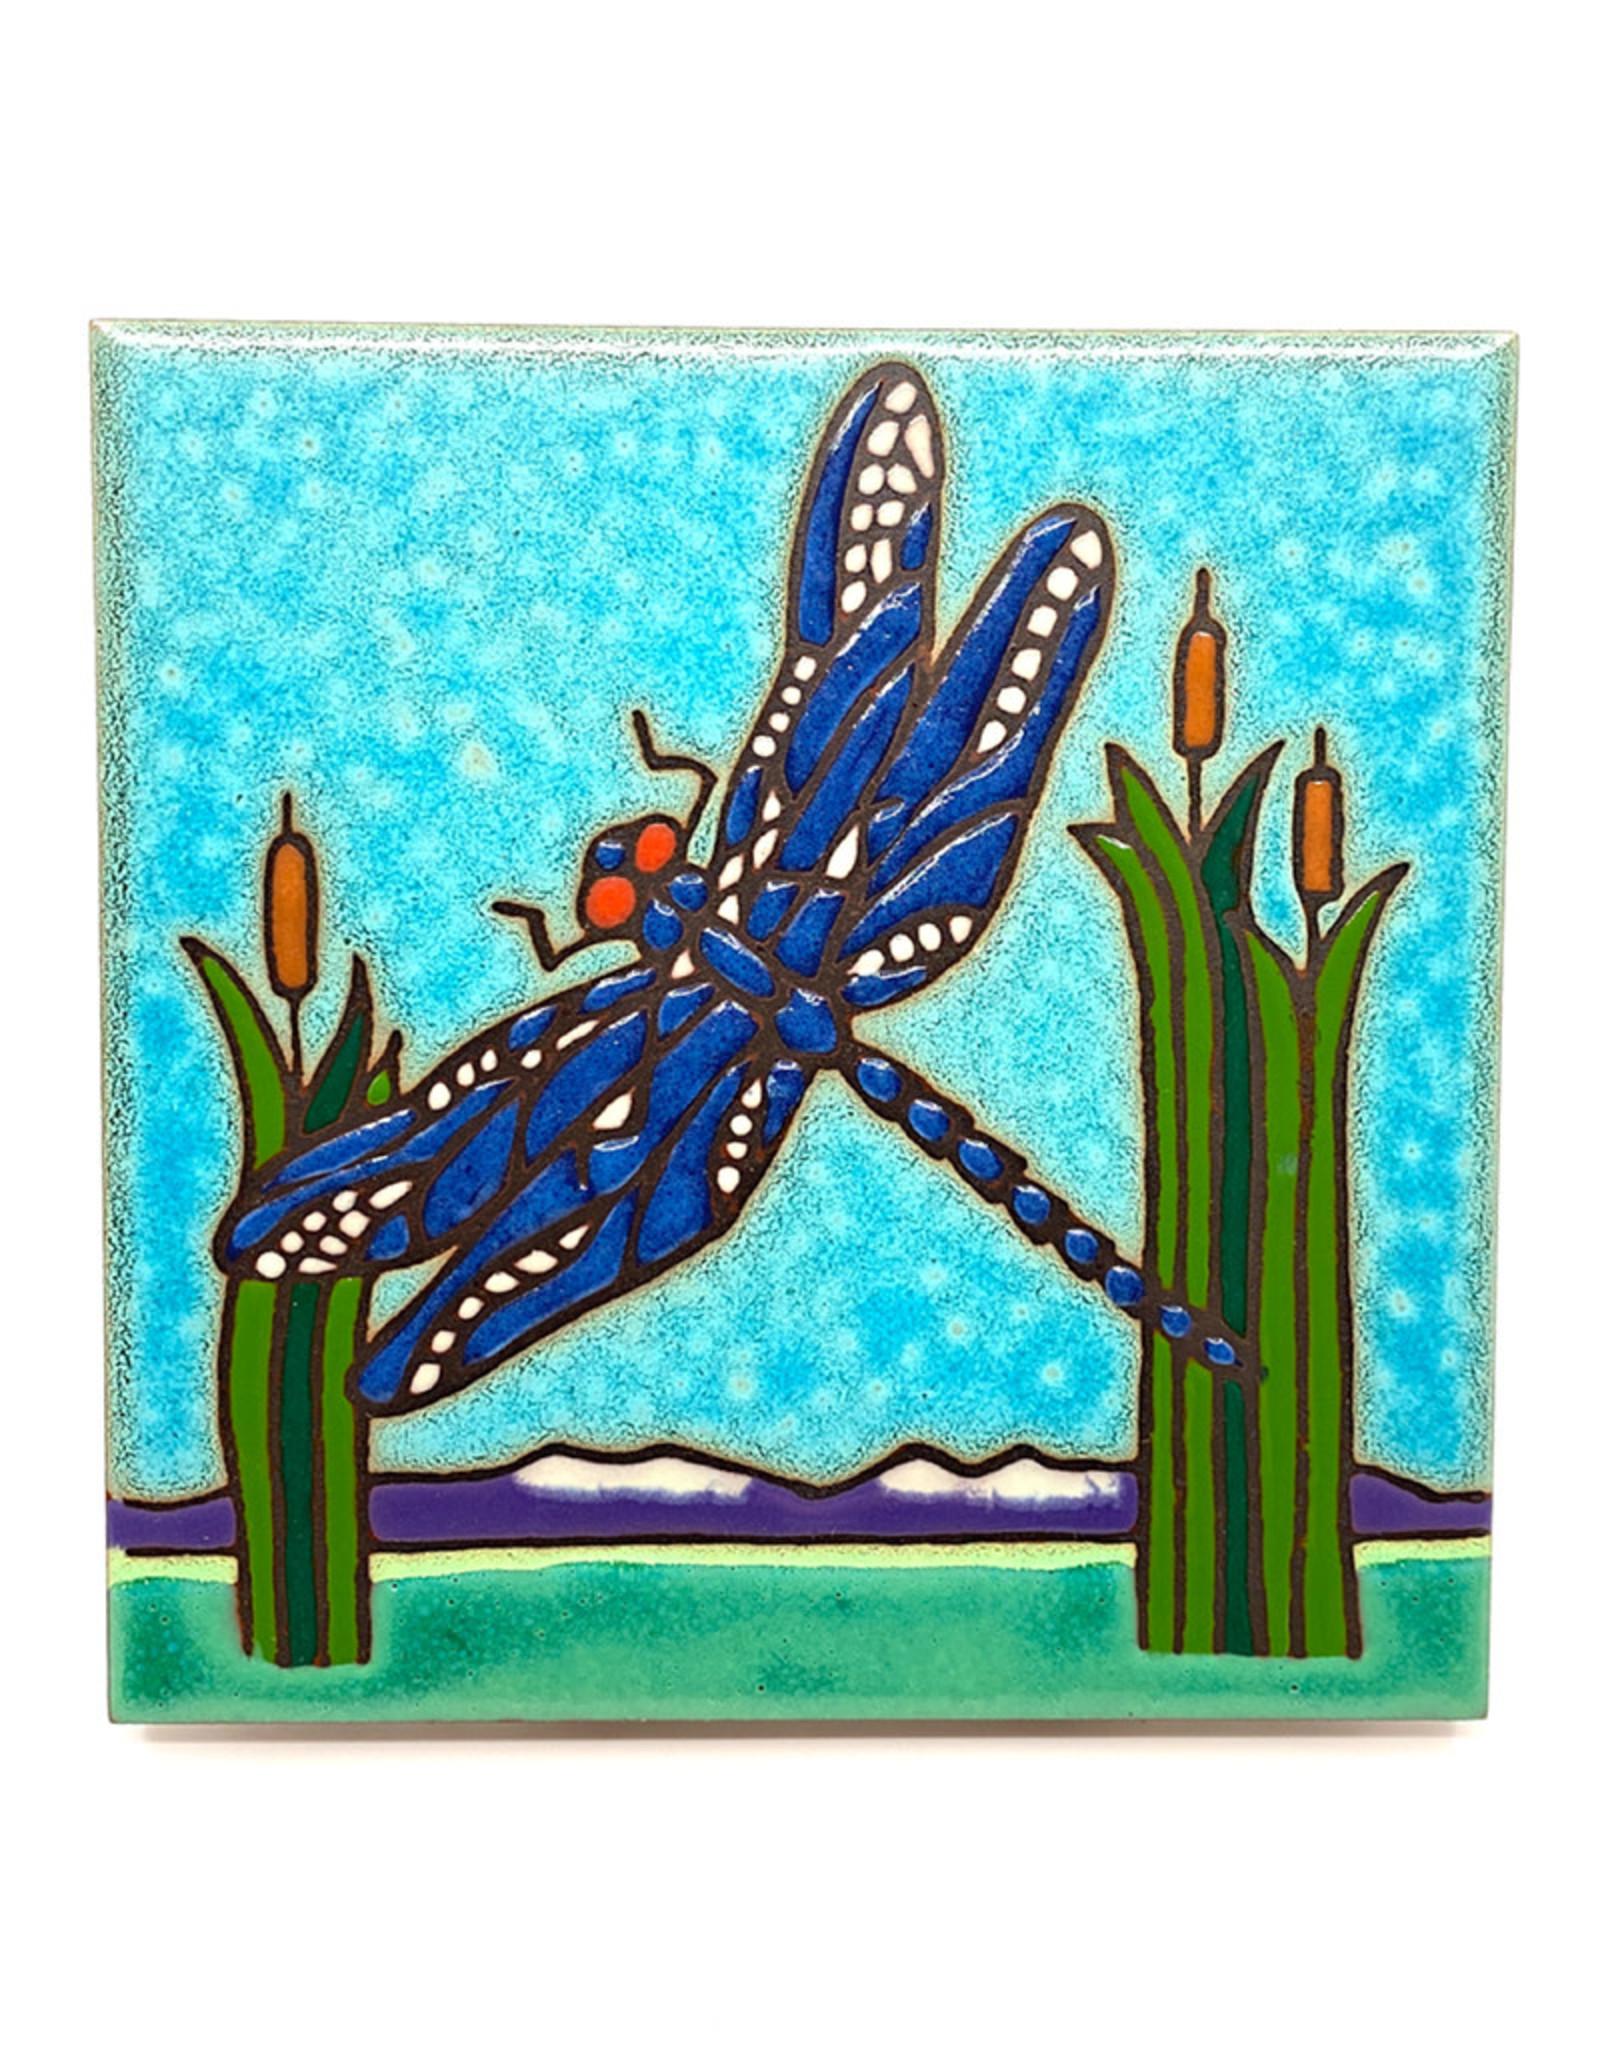 PACIFIC BLUE TILE DRAGONFLY TILE